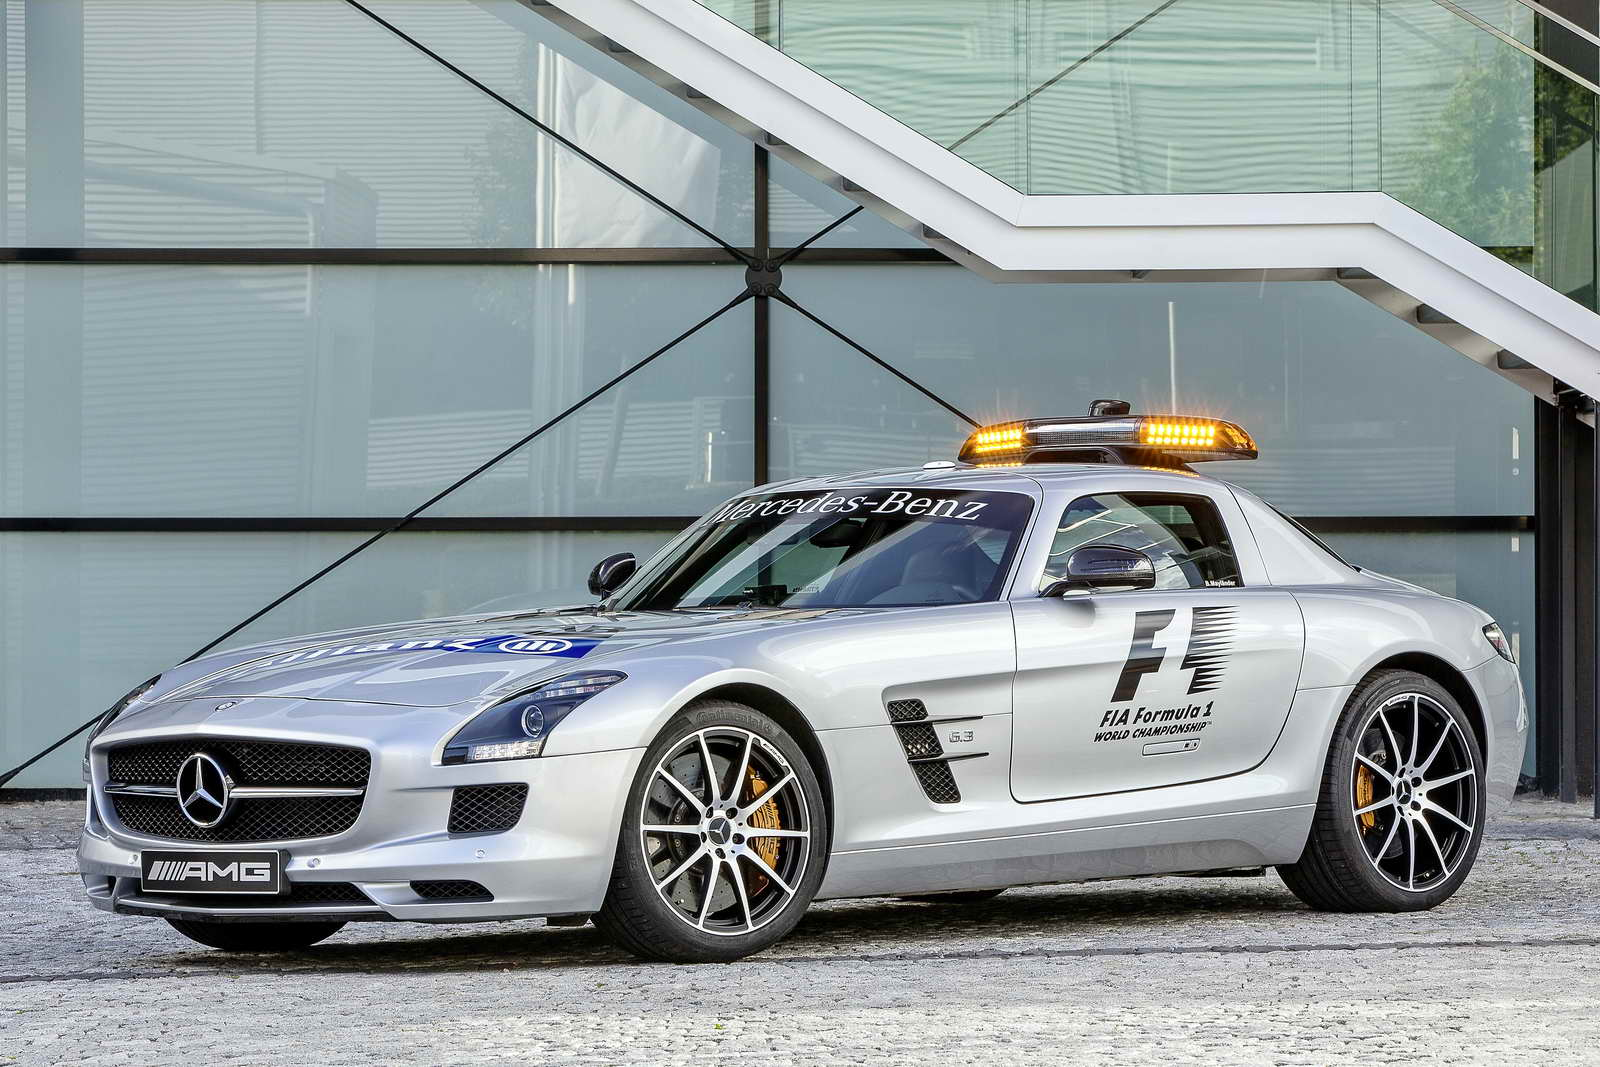 Mercedes_Benz_SLS_AMG_GT_Safety_Car_03